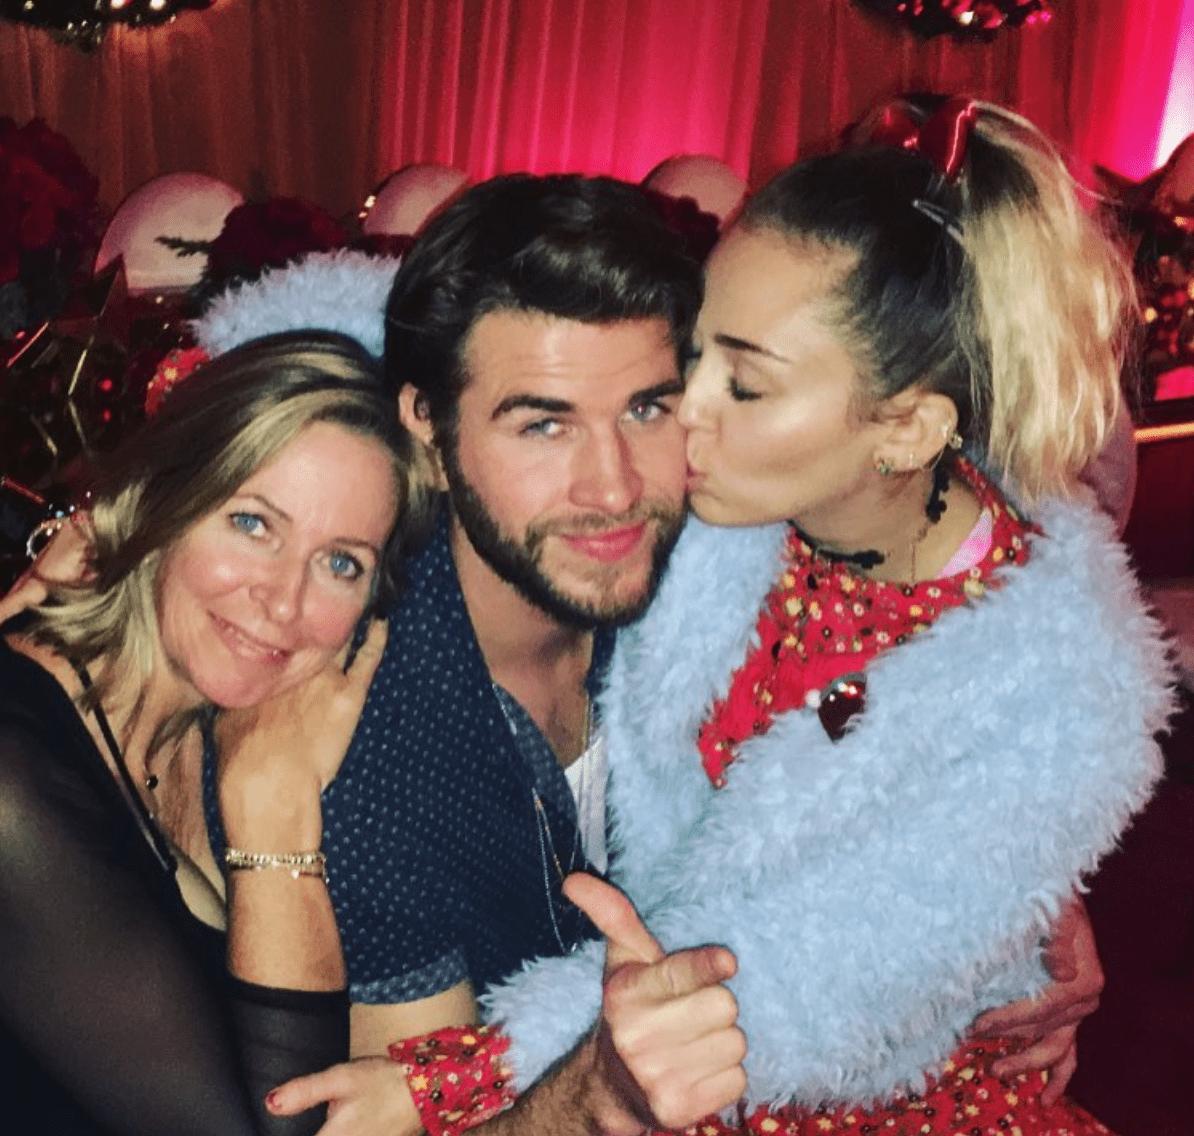 482afa3978c401 Miley Cyrus and Liam Hemsworth  wed six months ago  in secret ceremony